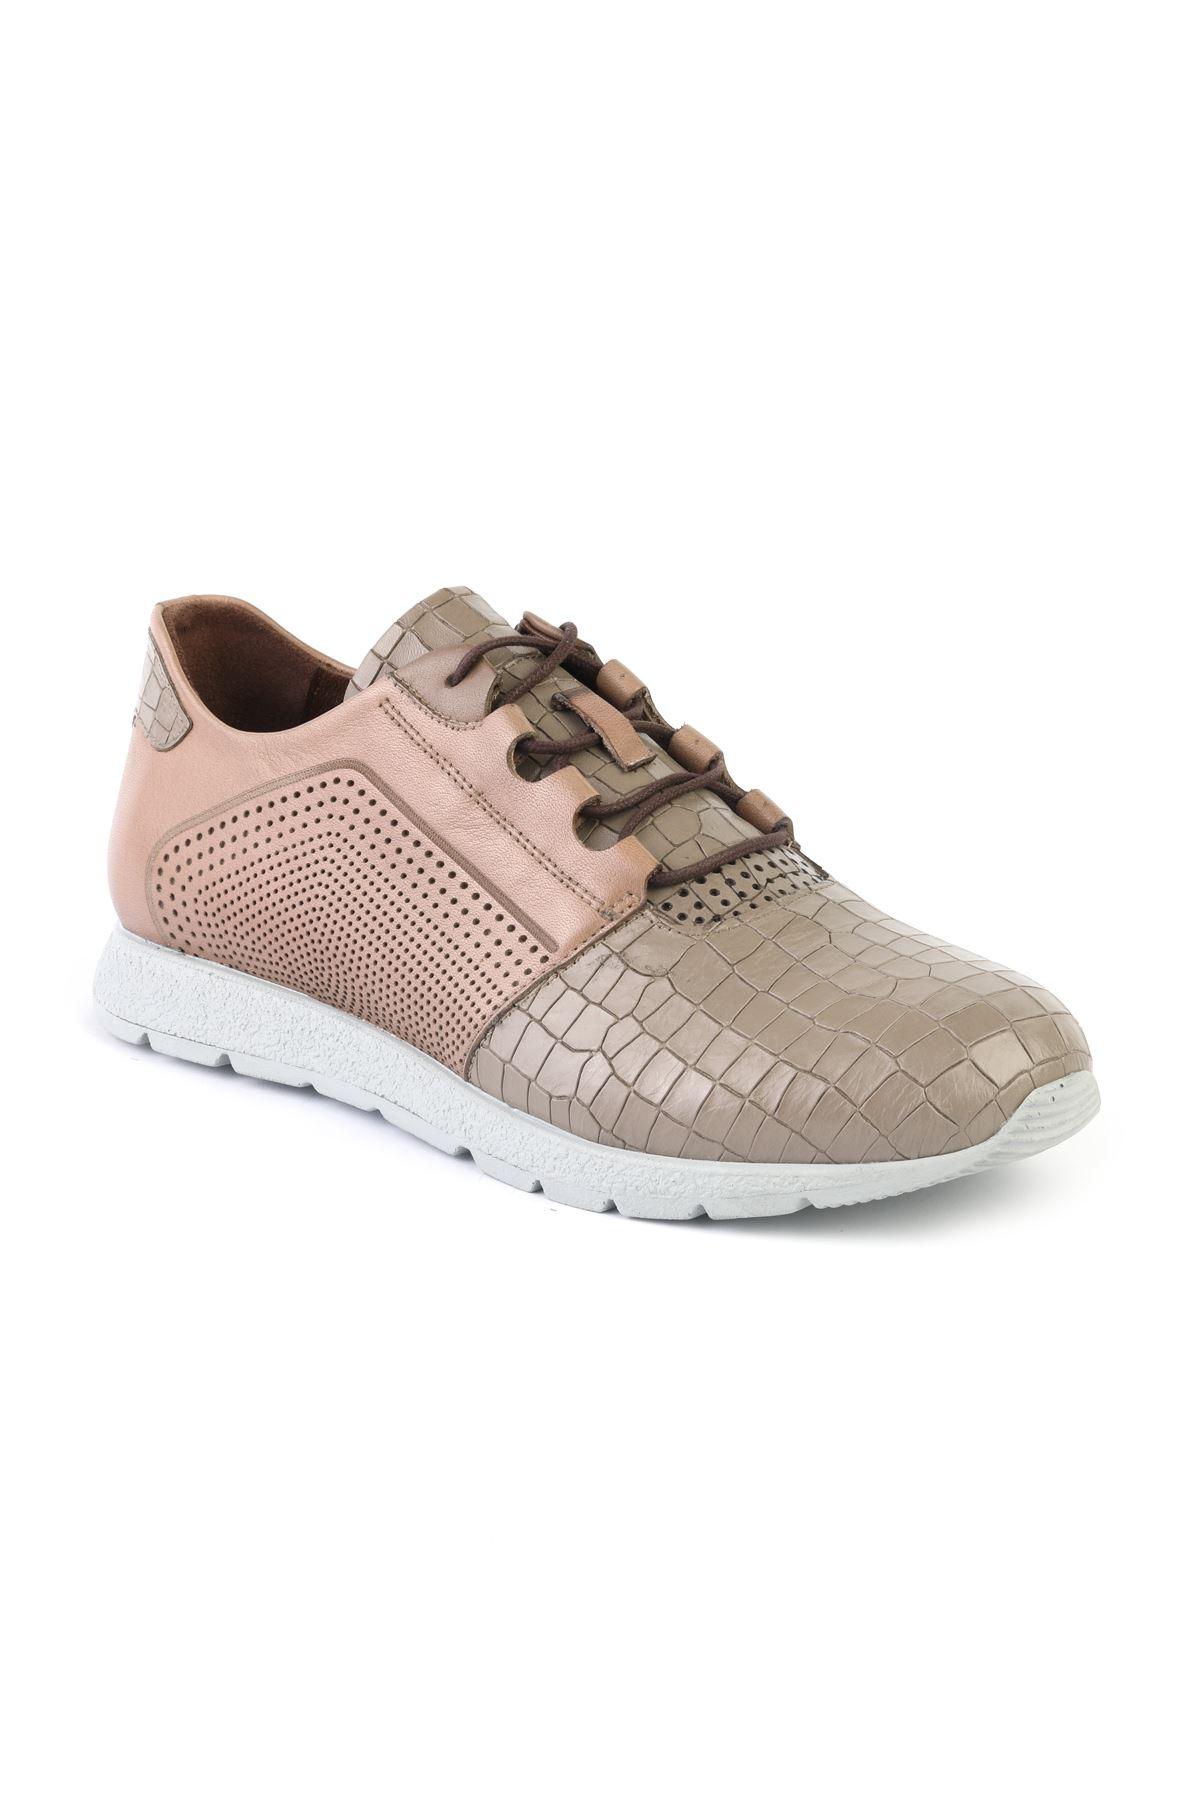 Libero T1211 Vizon Spor Ayakkabı